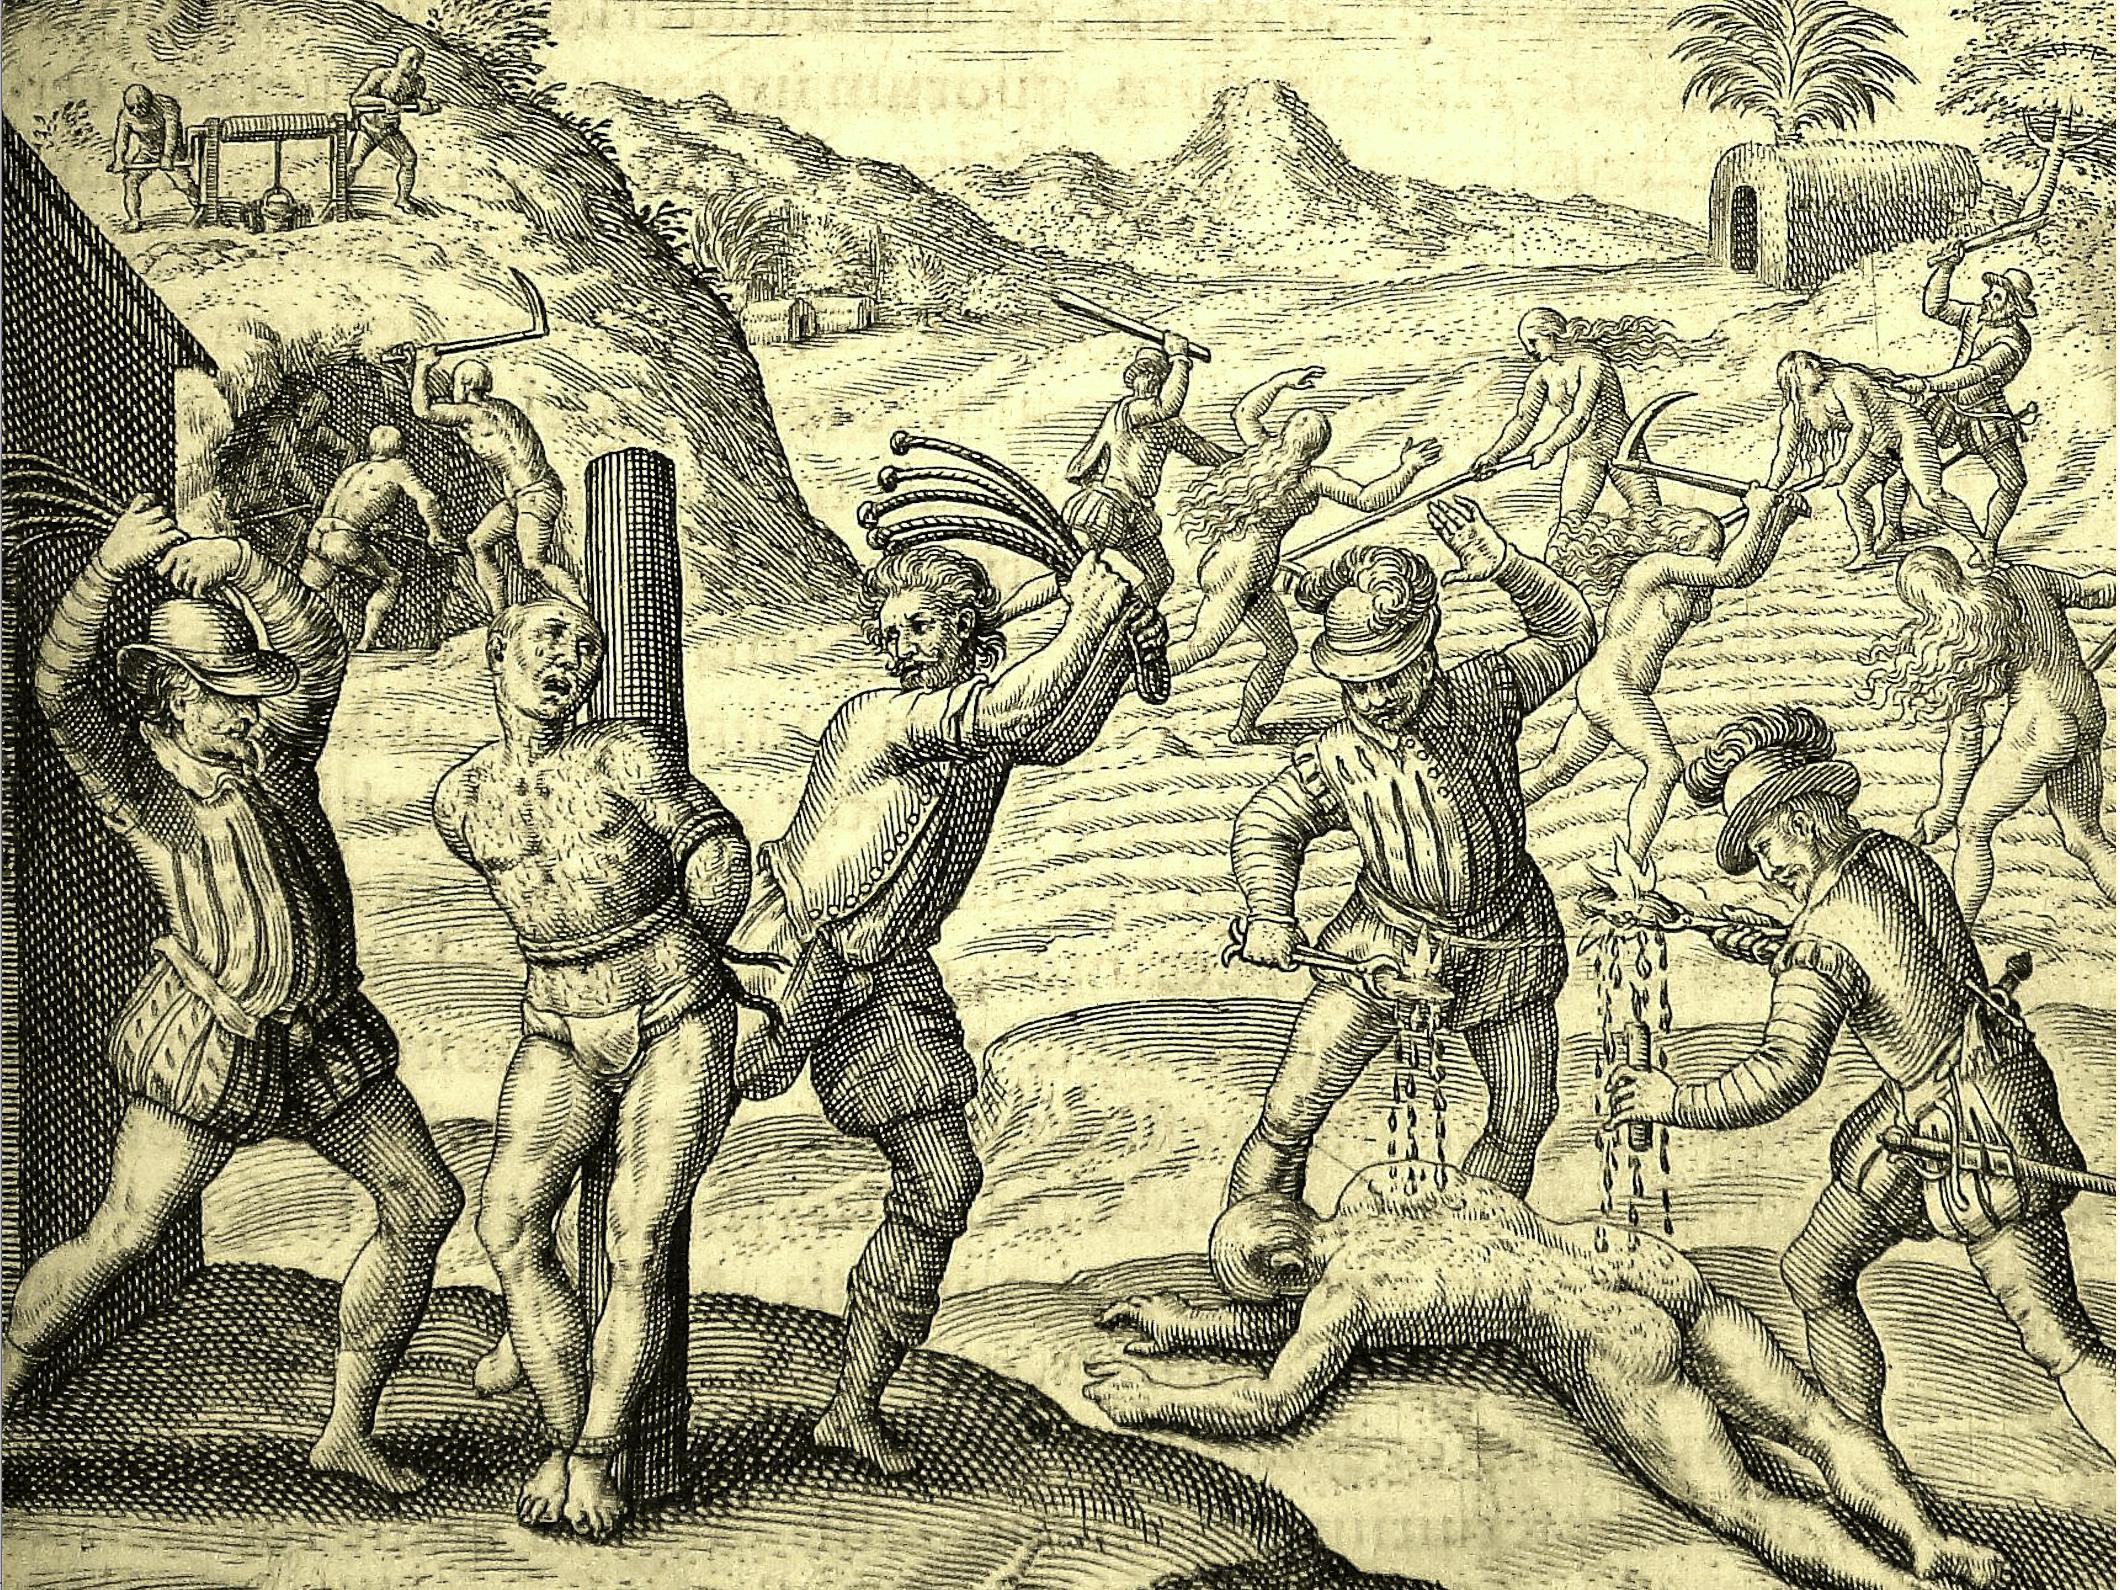 Bartelomeo De Las Casas Father To The Indians